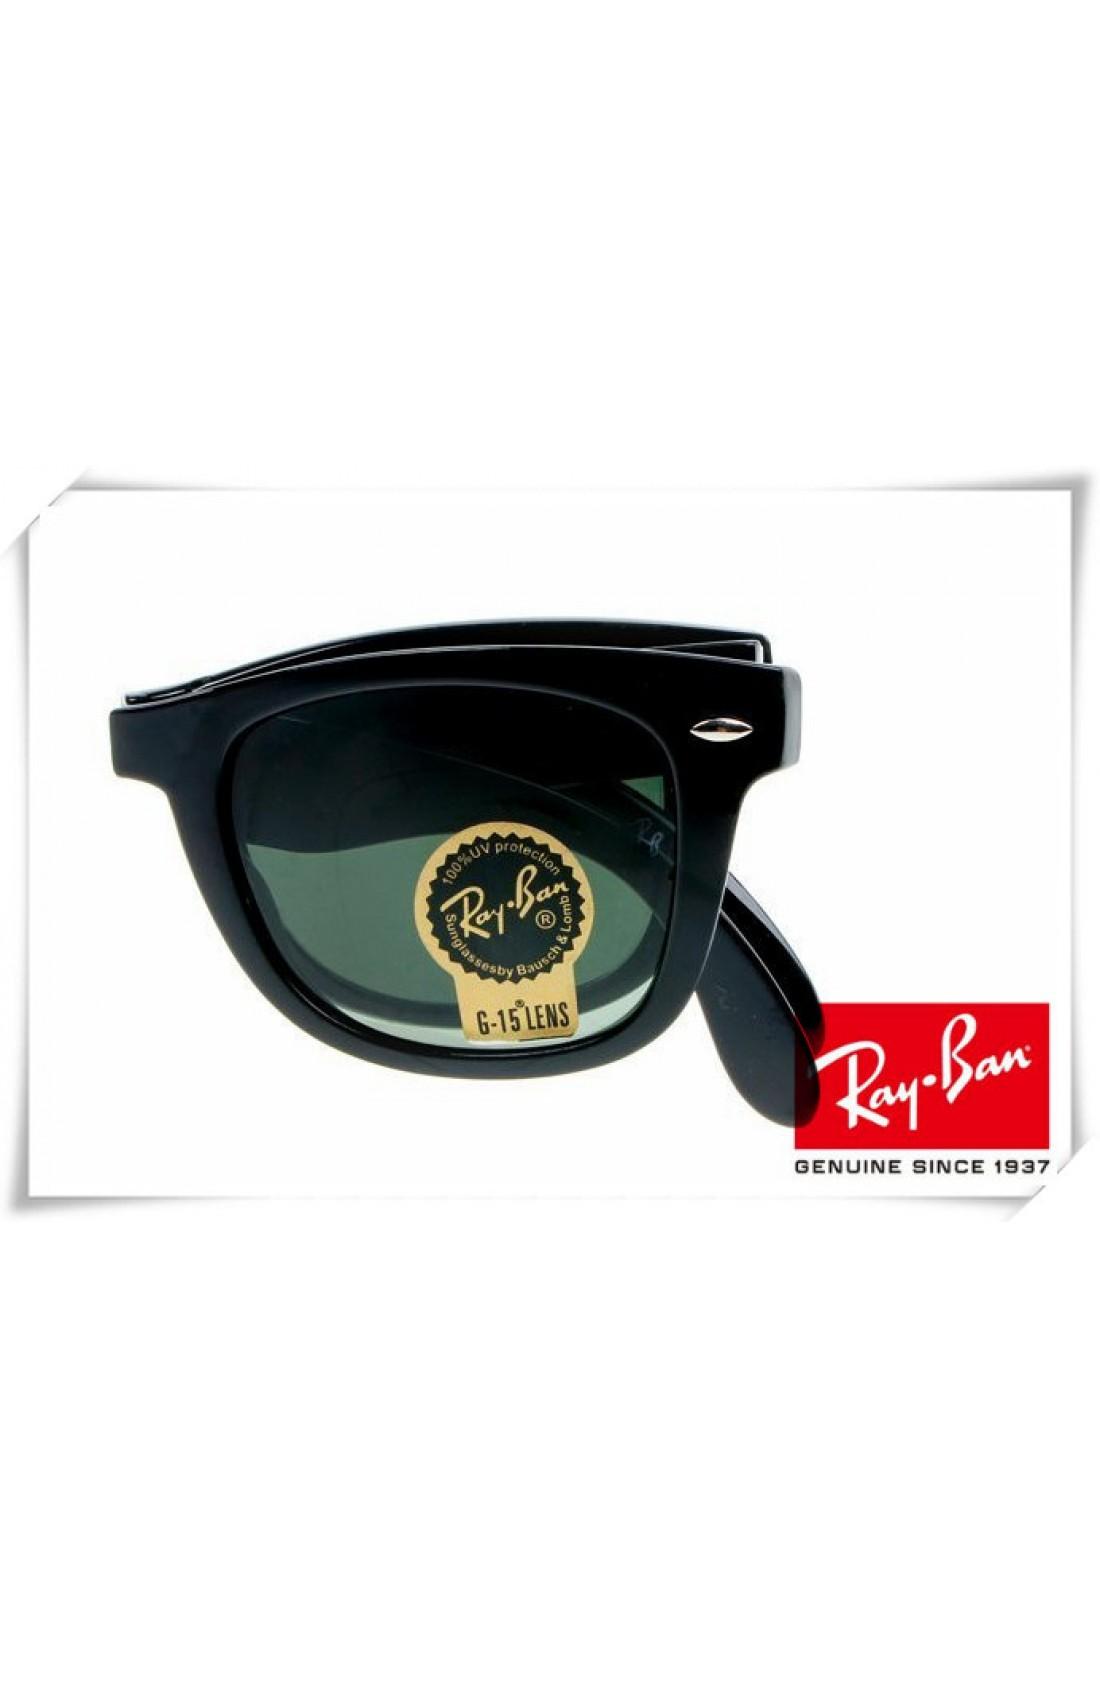 6f54305b3f Replica Ray Ban RB4105 Folding Wayfarer Sunglasses Black Frame Green ...